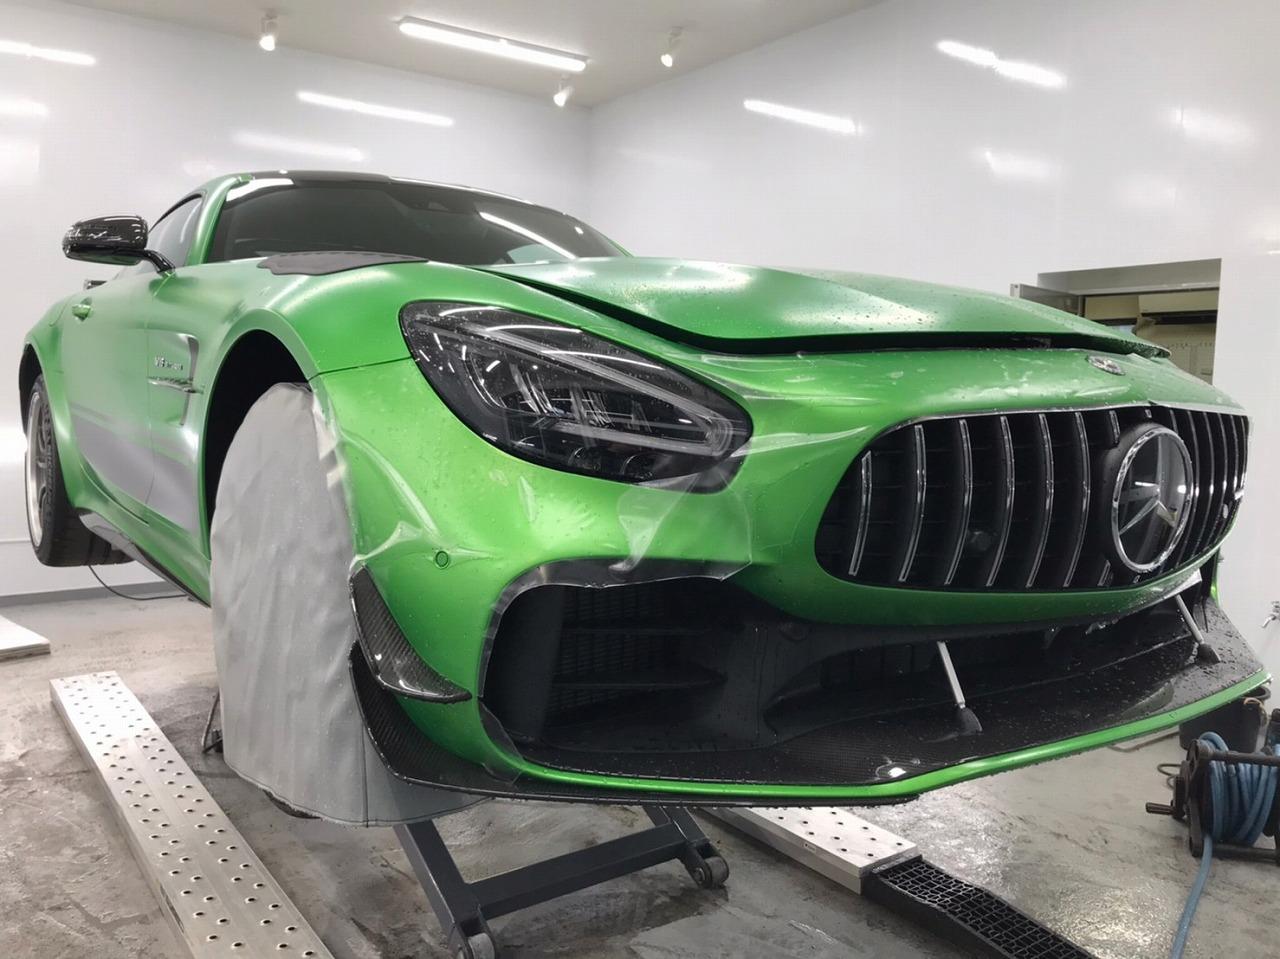 AMG GTR フロントバンパープロテクションフィルム施工